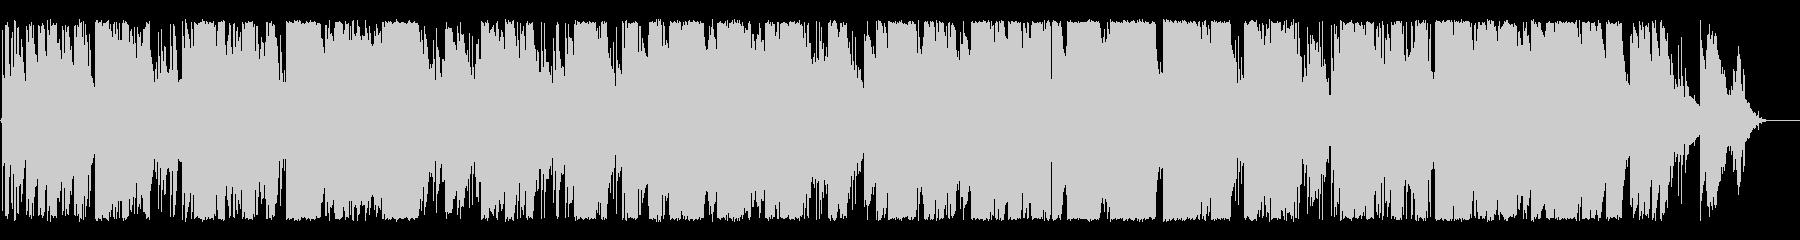 Amazing Grace (sax)の未再生の波形